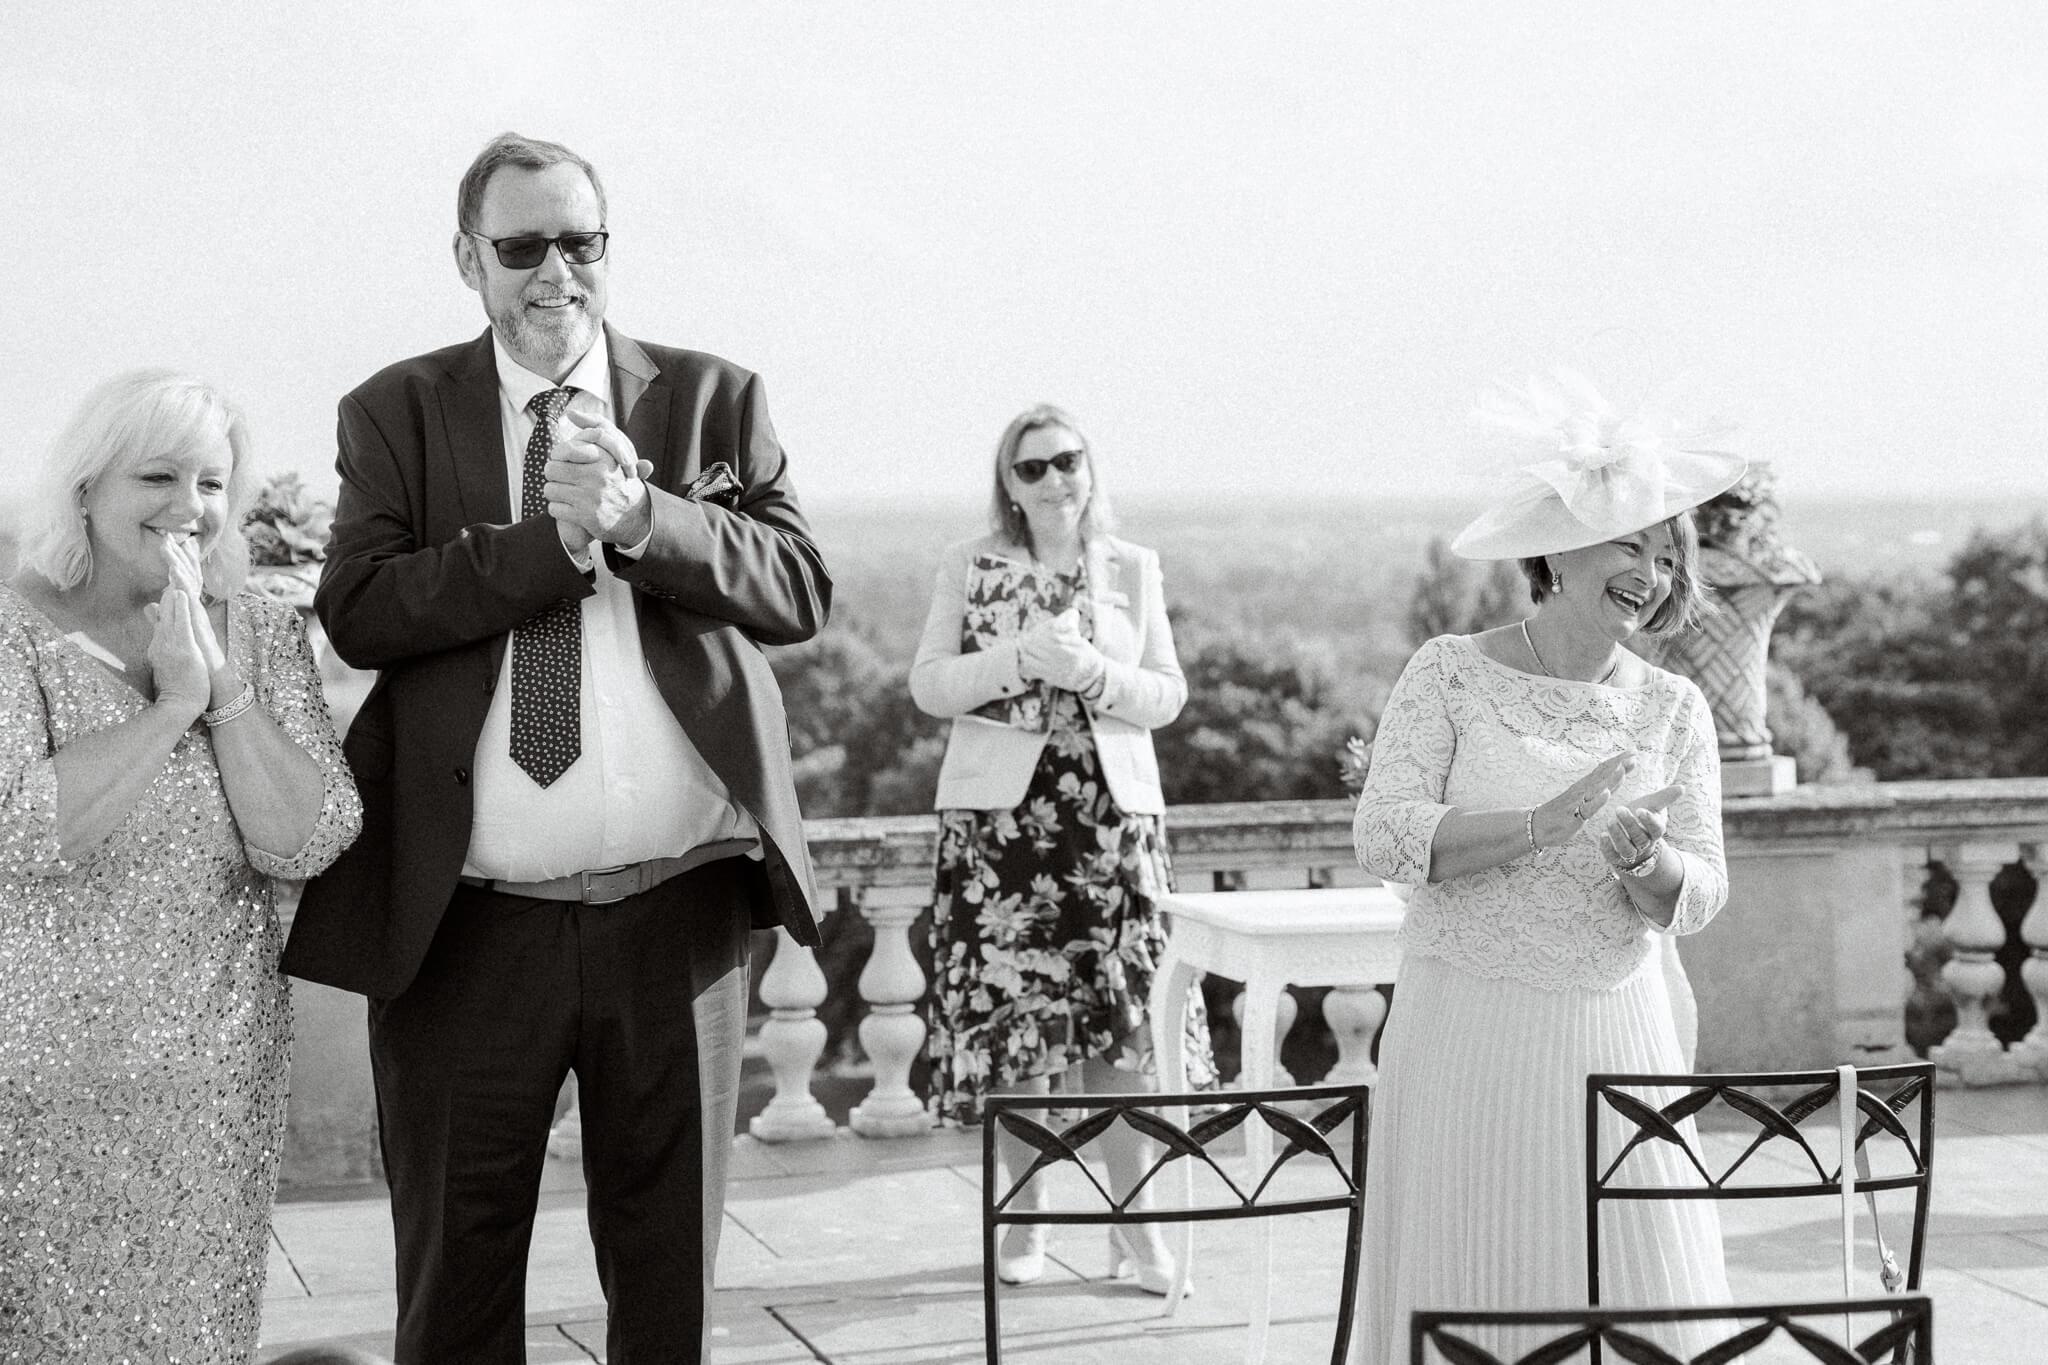 outdoor ceremony light and airy | Wedding photographer maidenhead